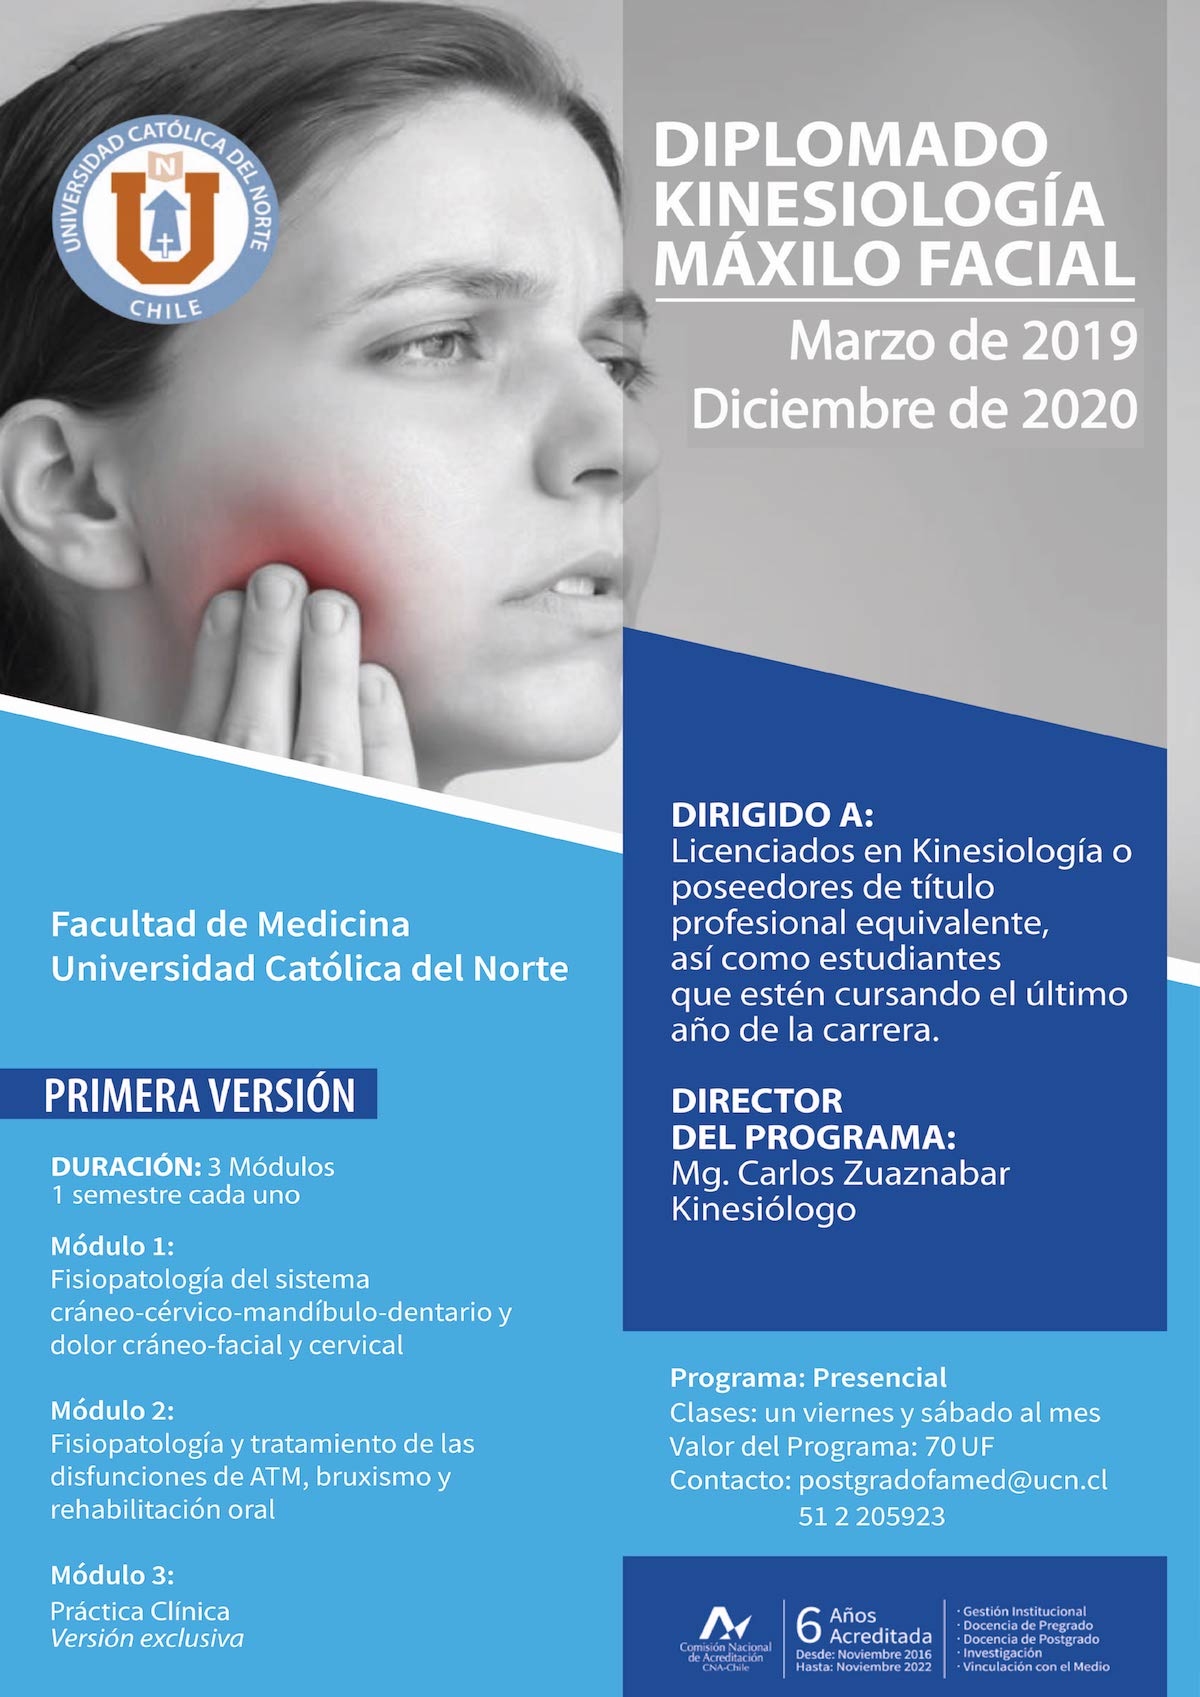 Diplomado en Kinesiologia Maxilo Facial – Facultad de Medicina – UCN